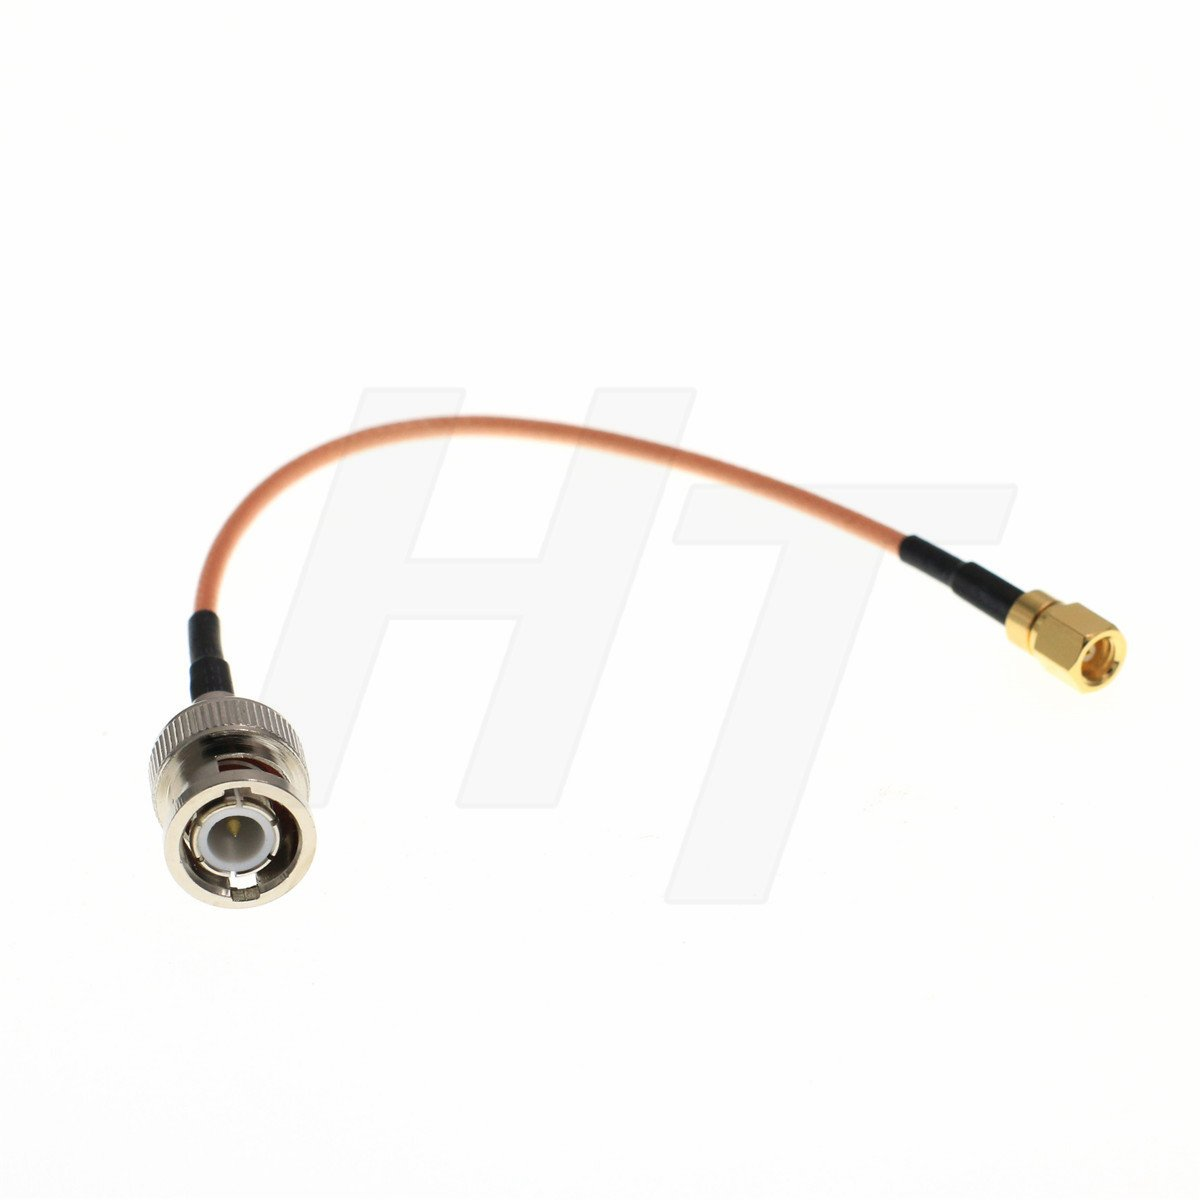 UHF PL259 Male to UHF Bulkhead Female 50Ω RG316 Coax Low Loss RF Cable